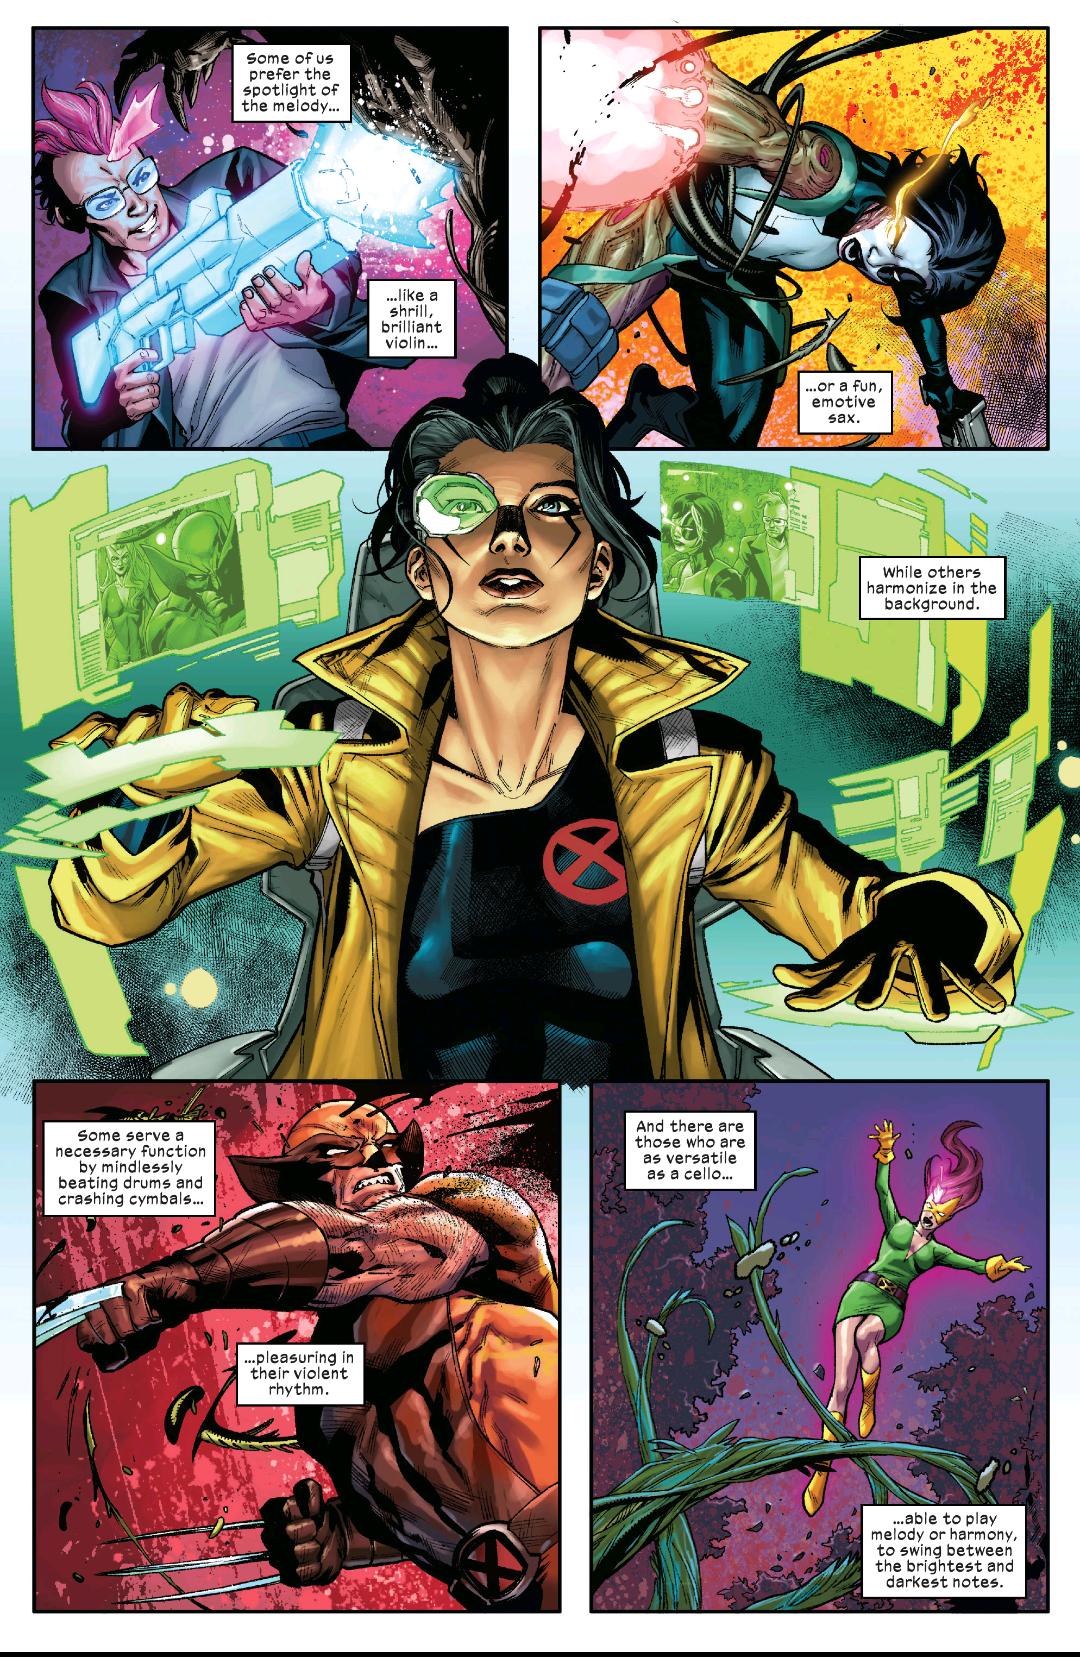 X-Force #6 - Marvel Comics (2020)